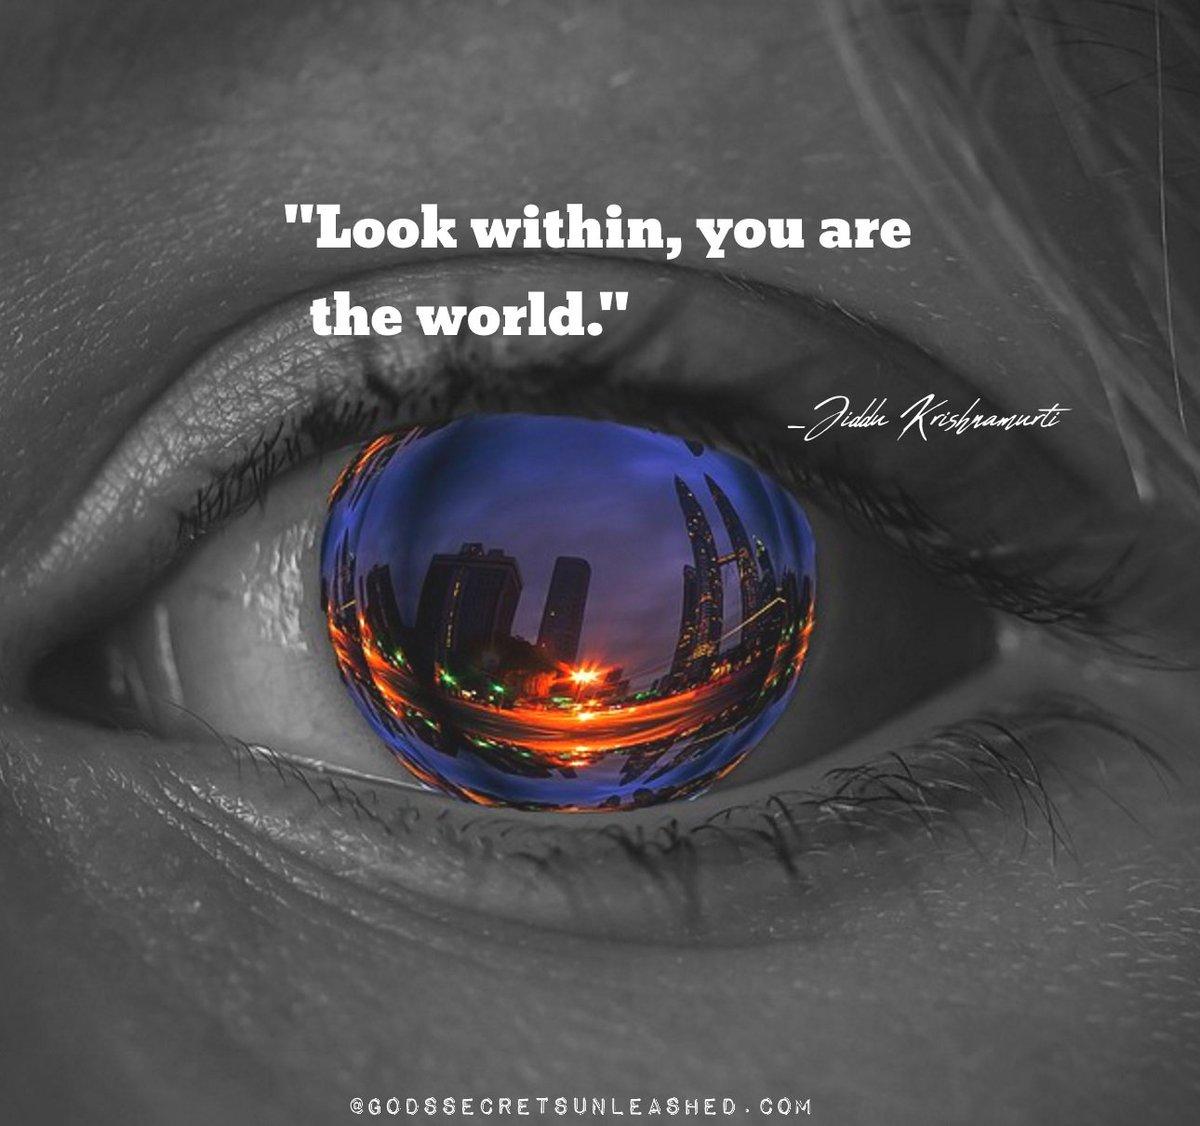 Sherolynn Braegger On Twitter Look Within You Are The World Jiddu Krishnamurti Inner Journey Awareness Creation Divine Universal Energy Love Light True Self Awakening Spiritual Growth Enlightenment Https T Co Ycydy0acke